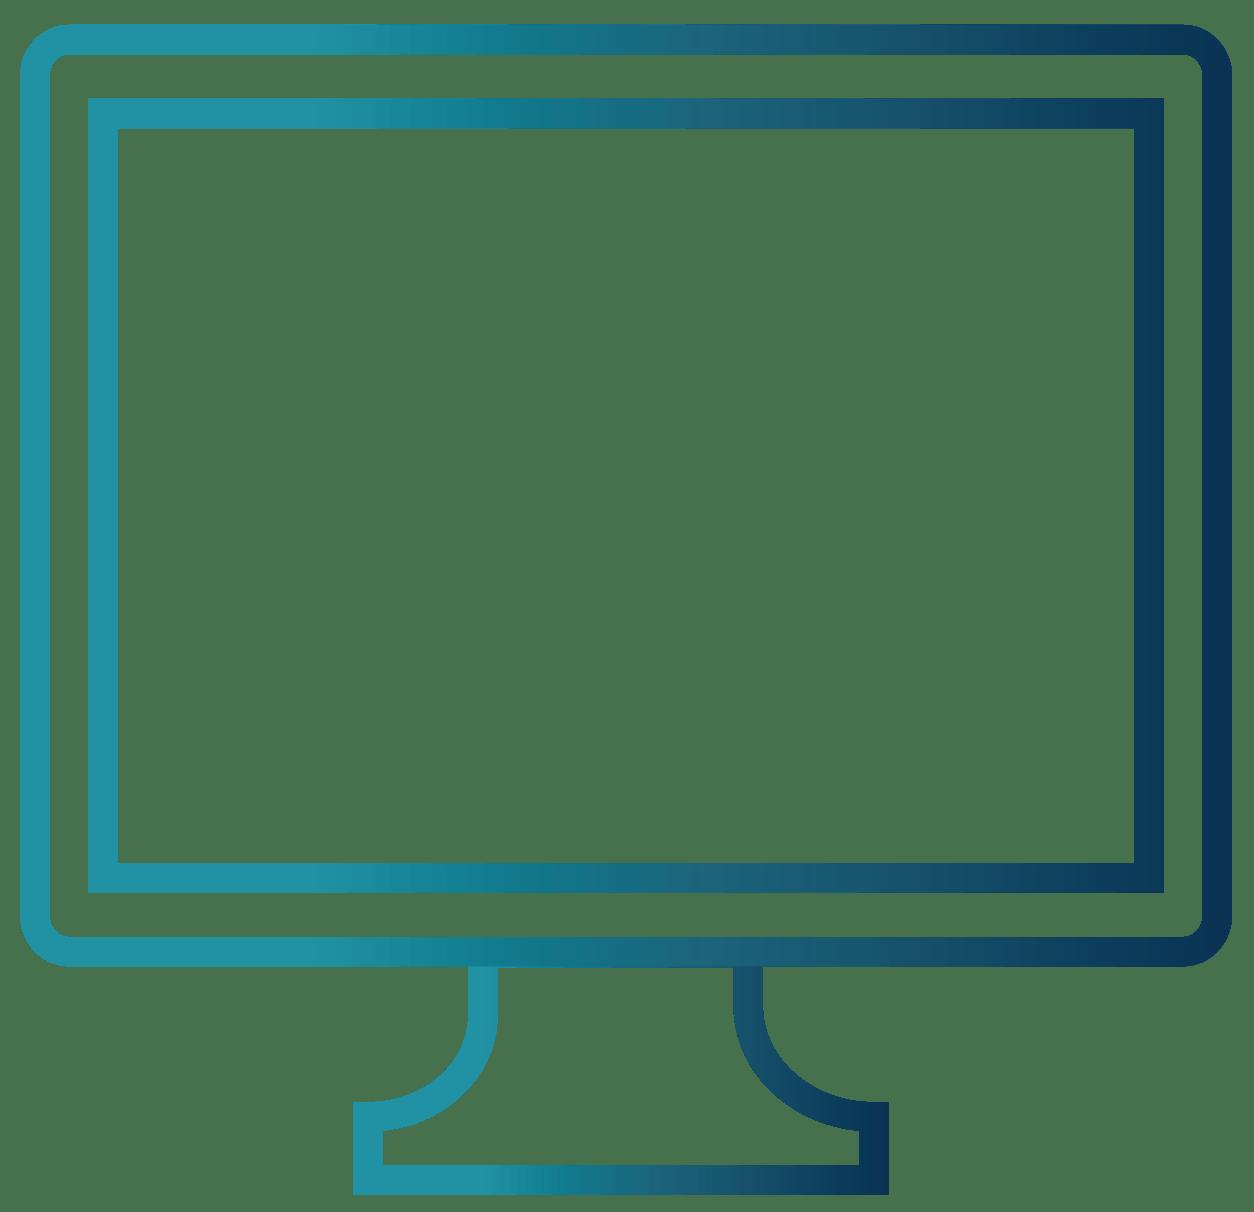 digital patient scheduling